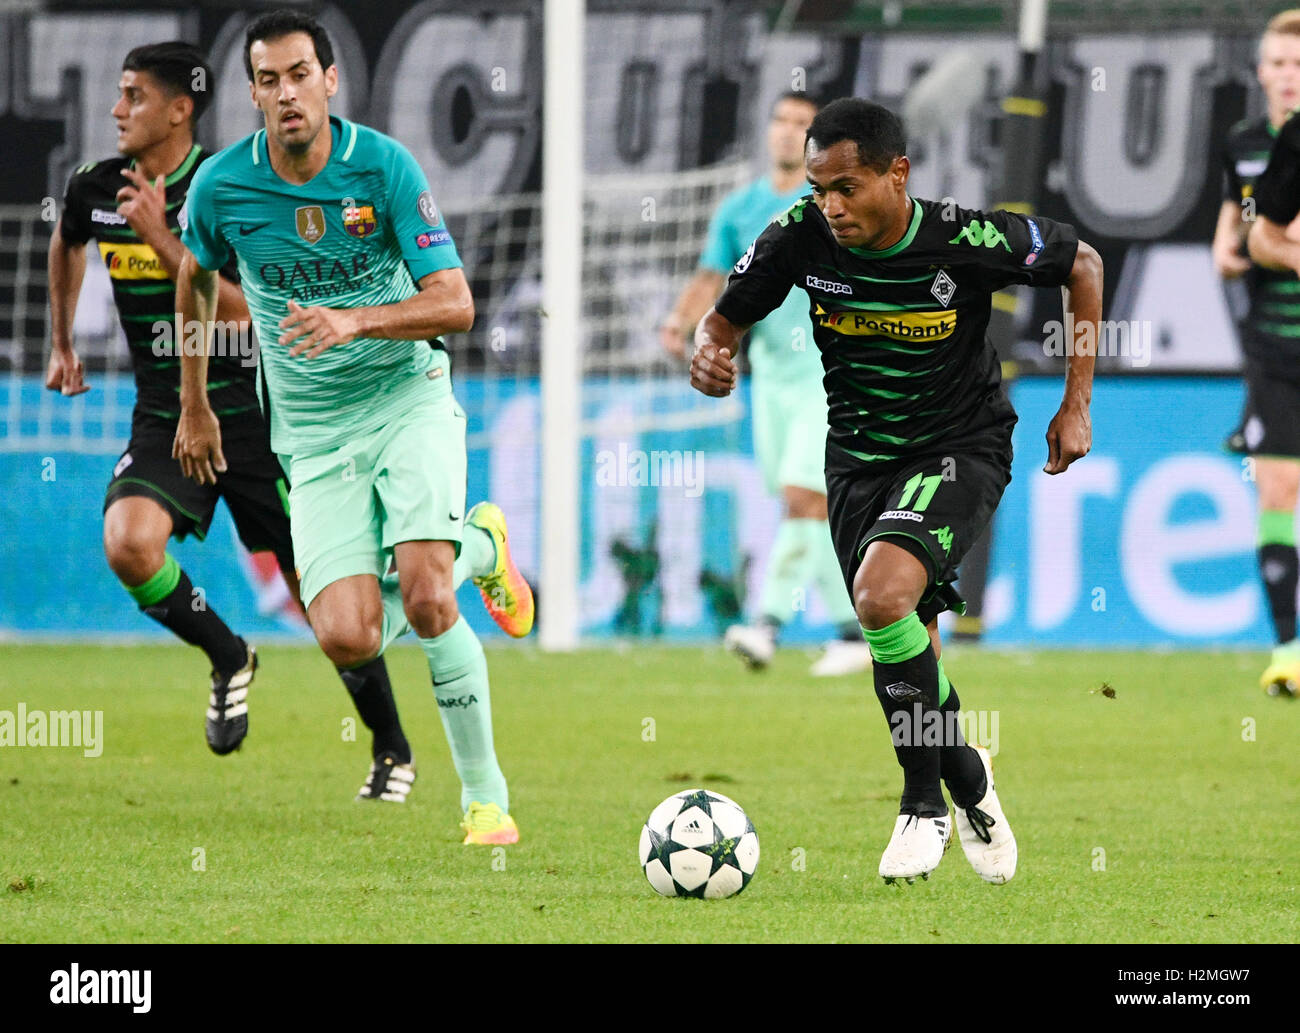 Borussia Park Mšnchengladbach, Germany 28.9.2016, Champions League Season 2016/17 group stage match day 2, Borussia - Stock Image